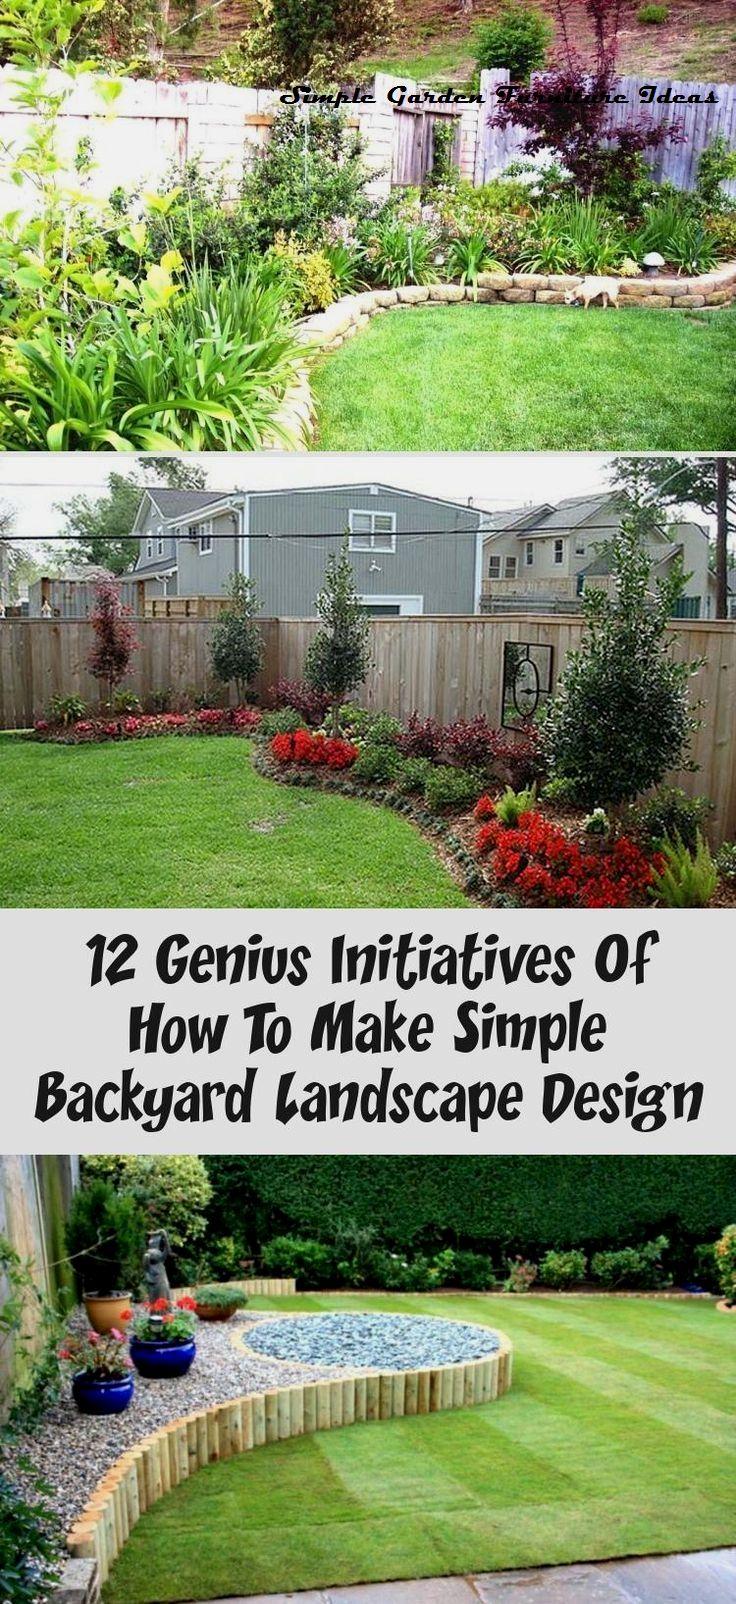 Most Affordable And Simple Garden Furniture Ideas Furniture Furnituremakeover In 2020 Backyard Landscaping Designs Small Garden Layout Diy Garden Furniture